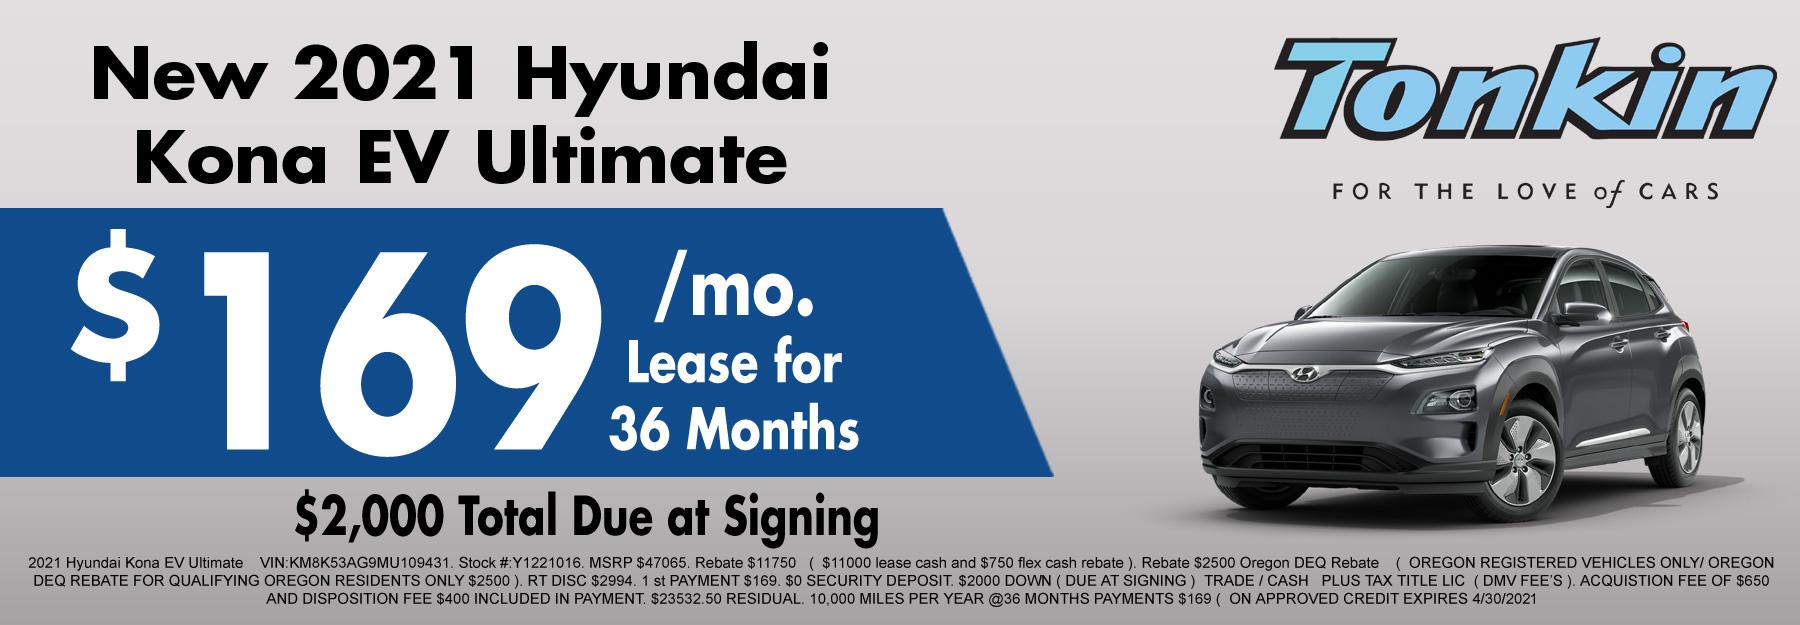 New Hyundai Kona Special